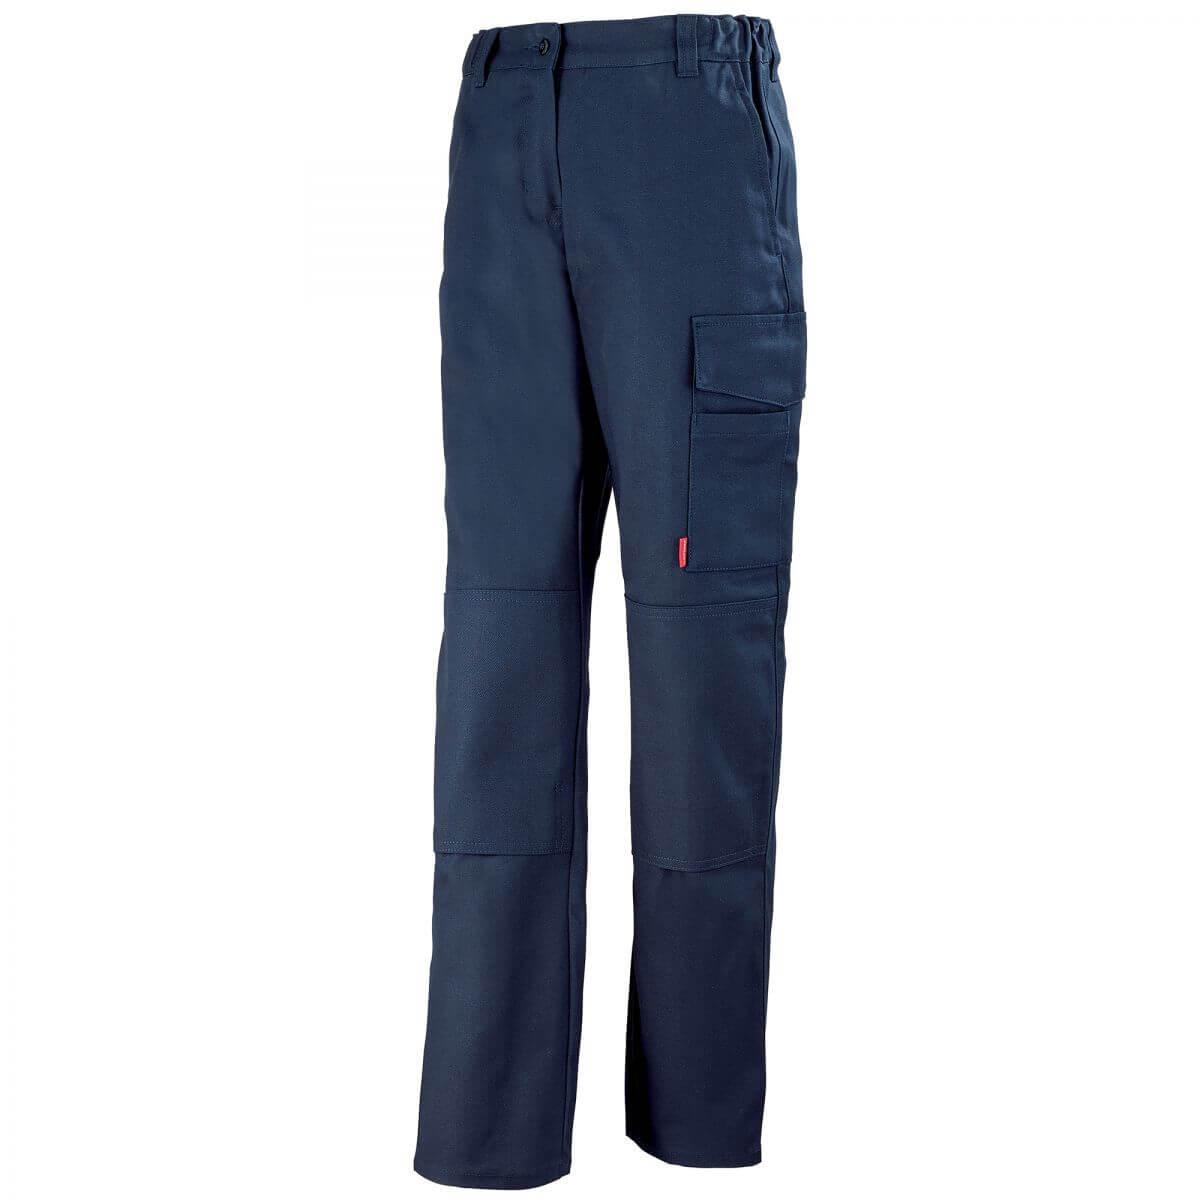 pantalon de travail femme bleu marine pantalons de. Black Bedroom Furniture Sets. Home Design Ideas